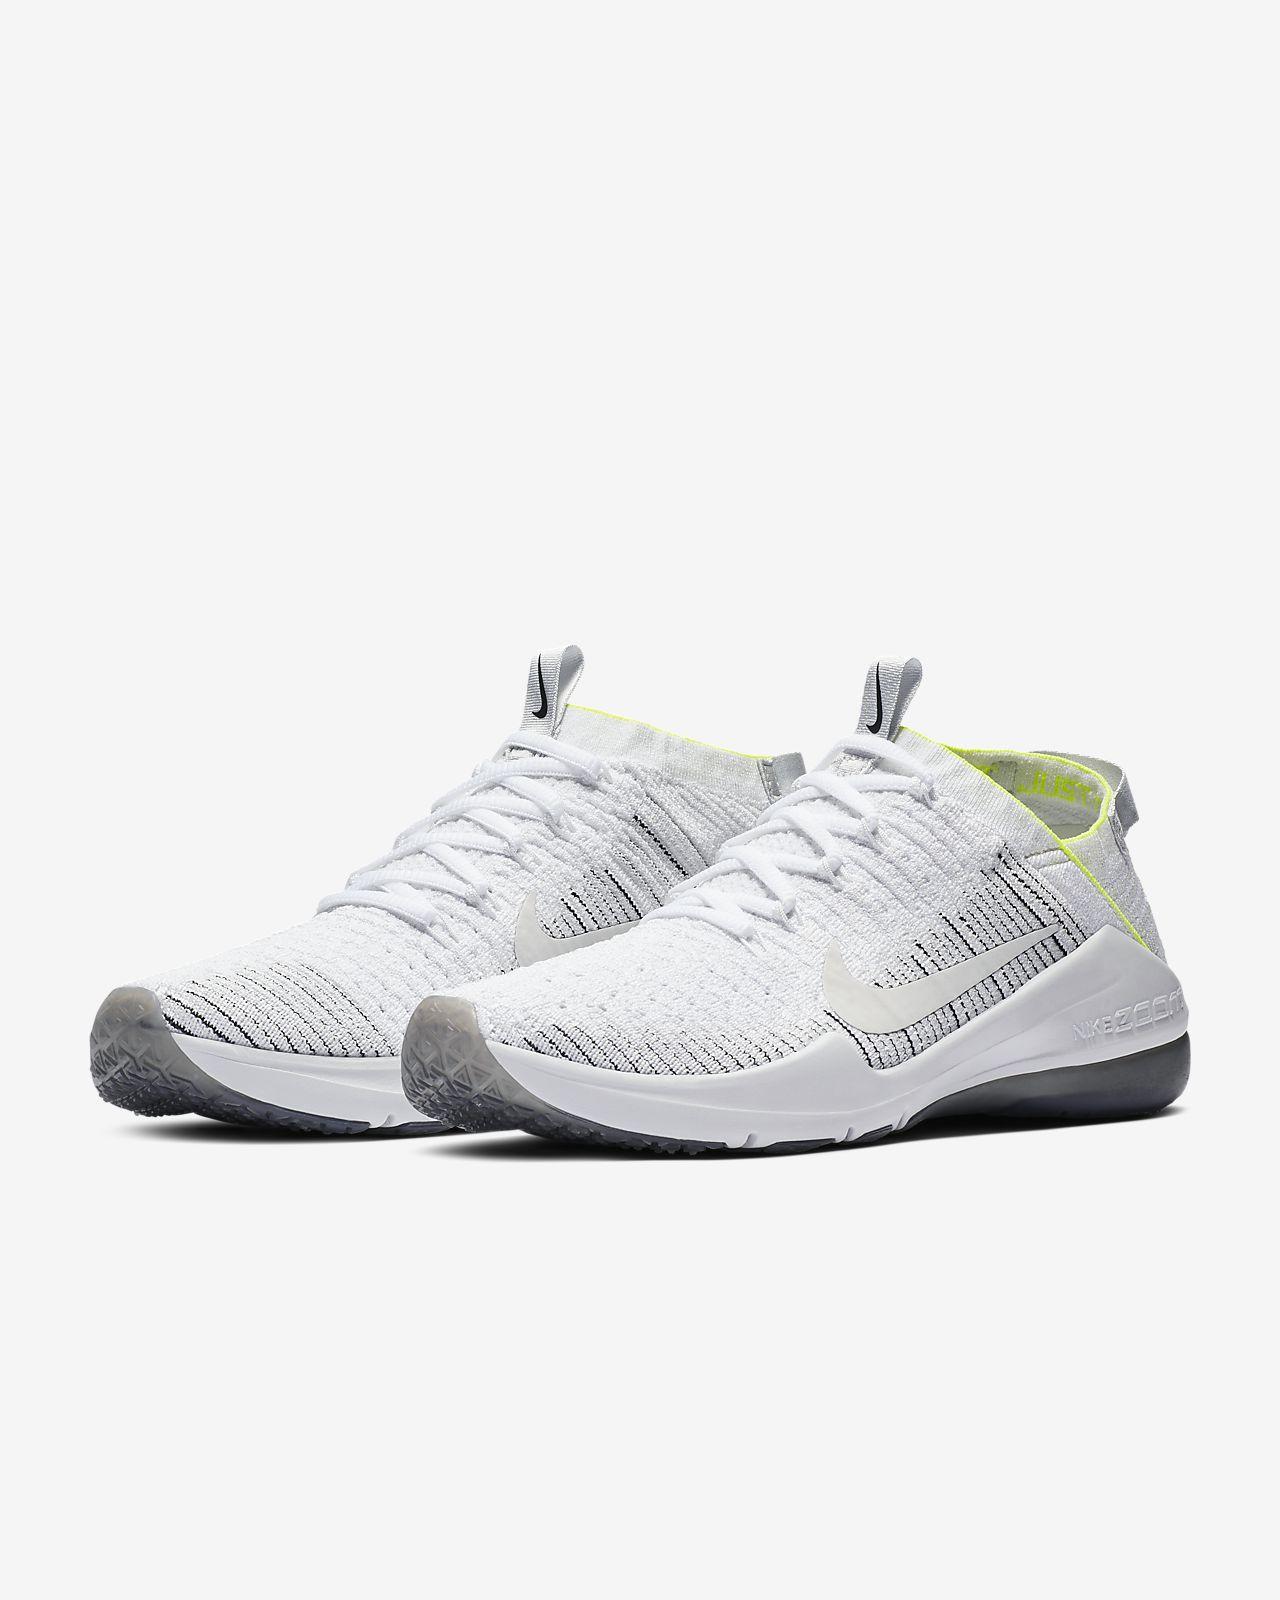 24969723f1c7 ... Dámská bota Nike Air Zoom Fearless Flyknit 2 do fitka